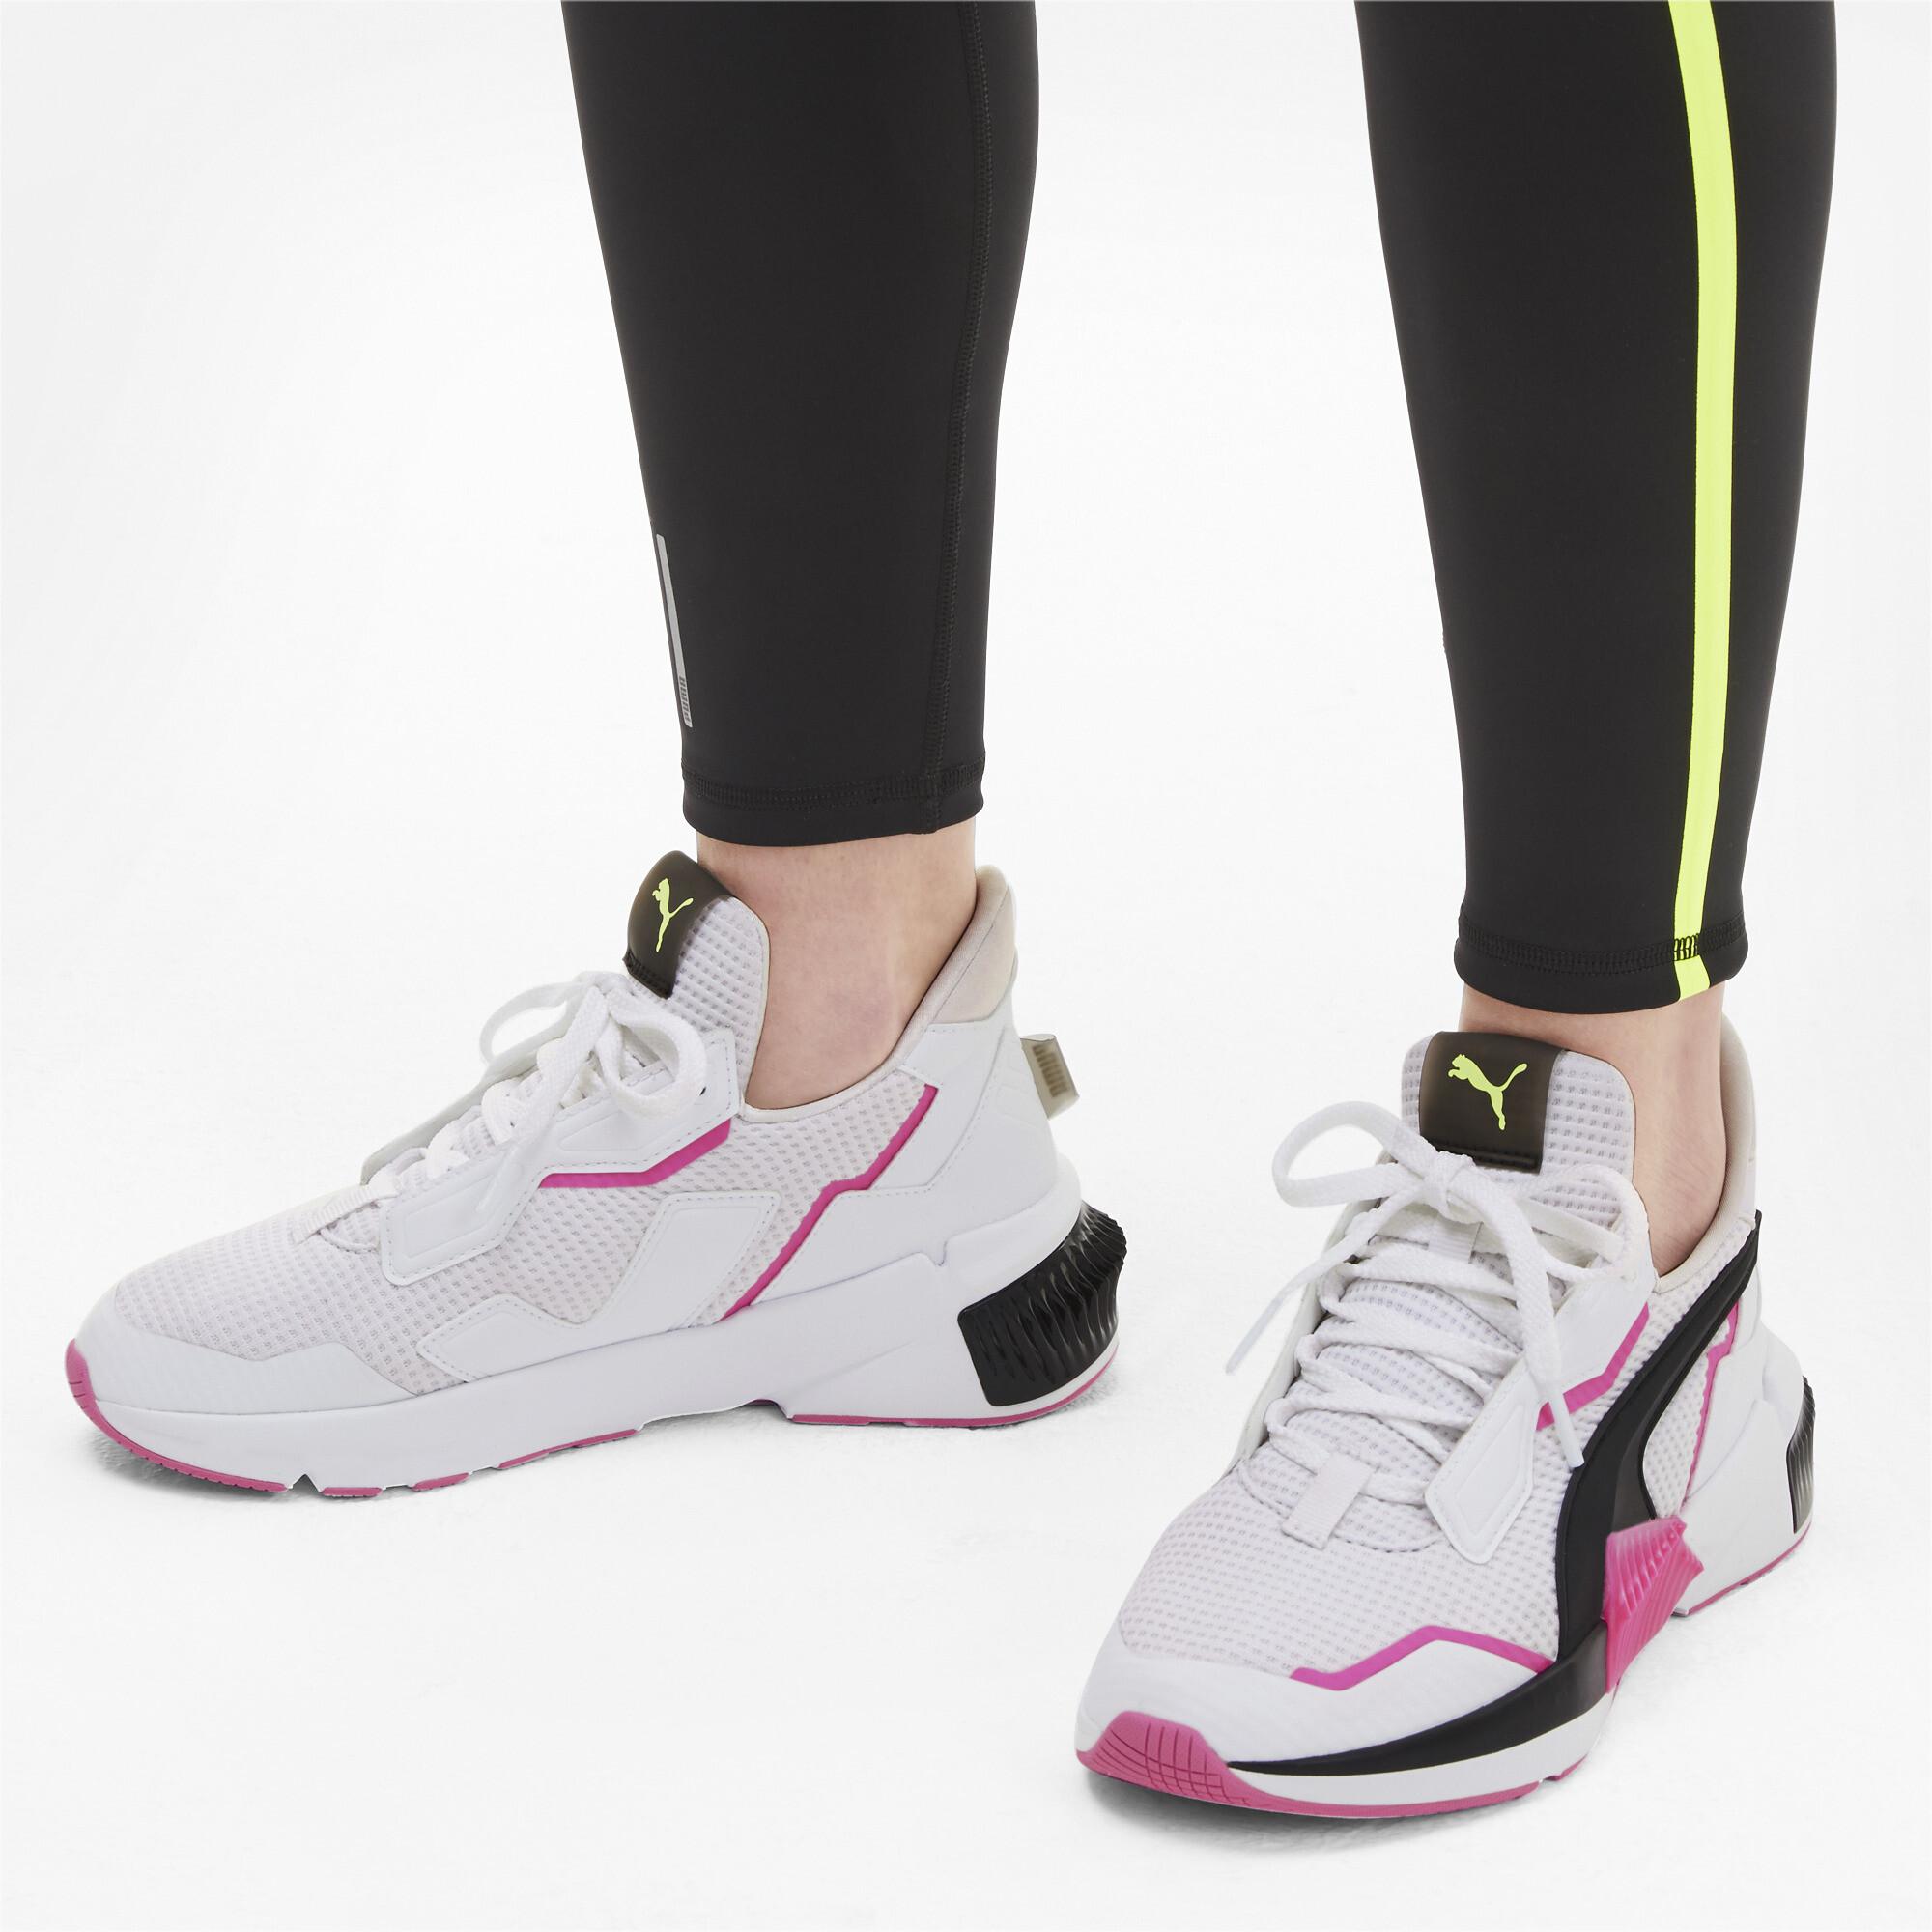 Indexbild 5 - PUMA Provoke XT Damen Trainingsschuhe Frauen Stiefelette Training Neu